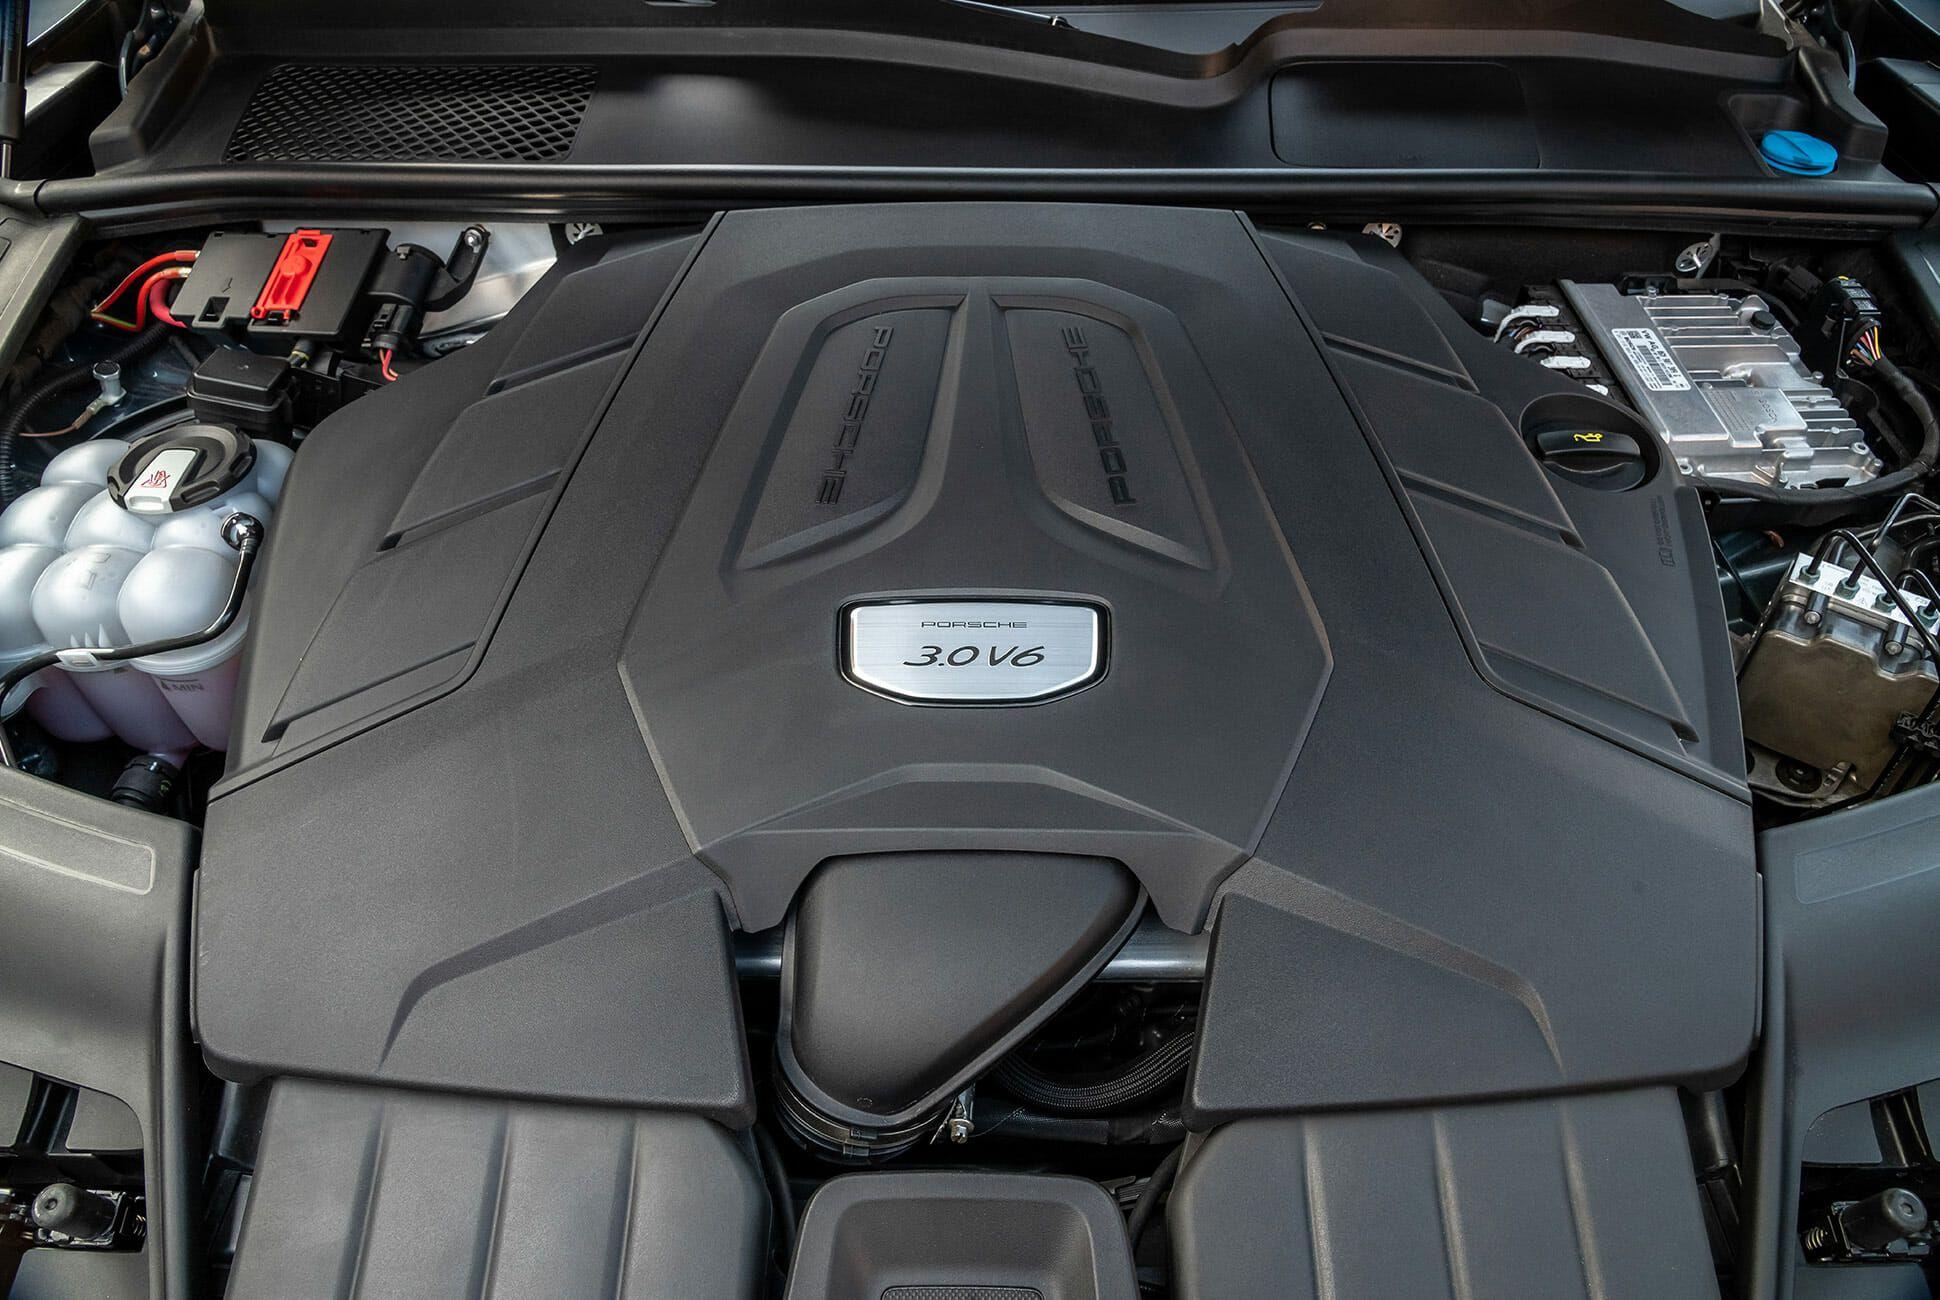 Porsche-Cayenne-Review-gear-patrol-slide-10